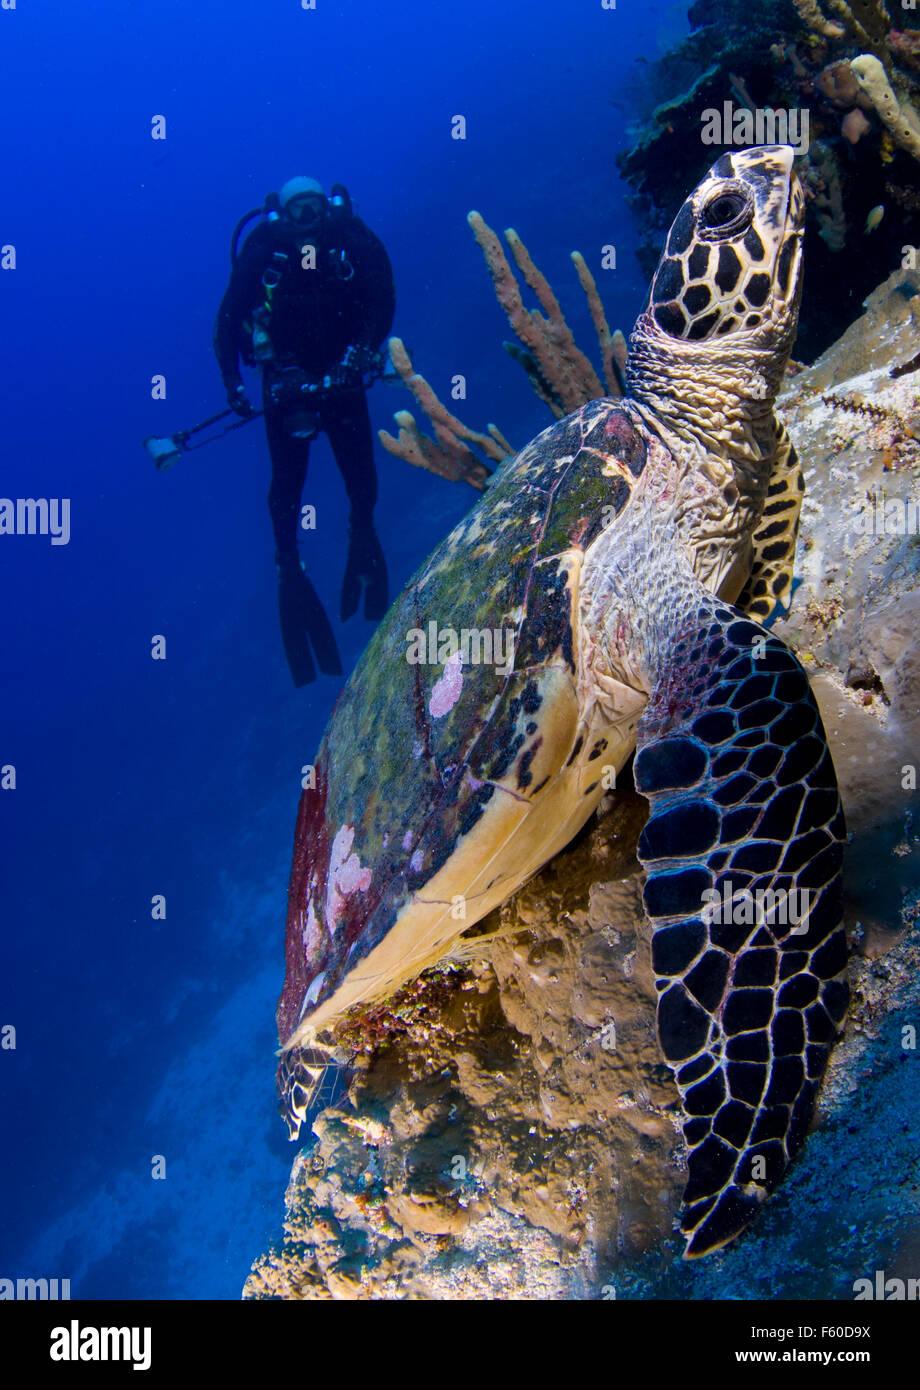 Hawksbill turtle - Stock Image